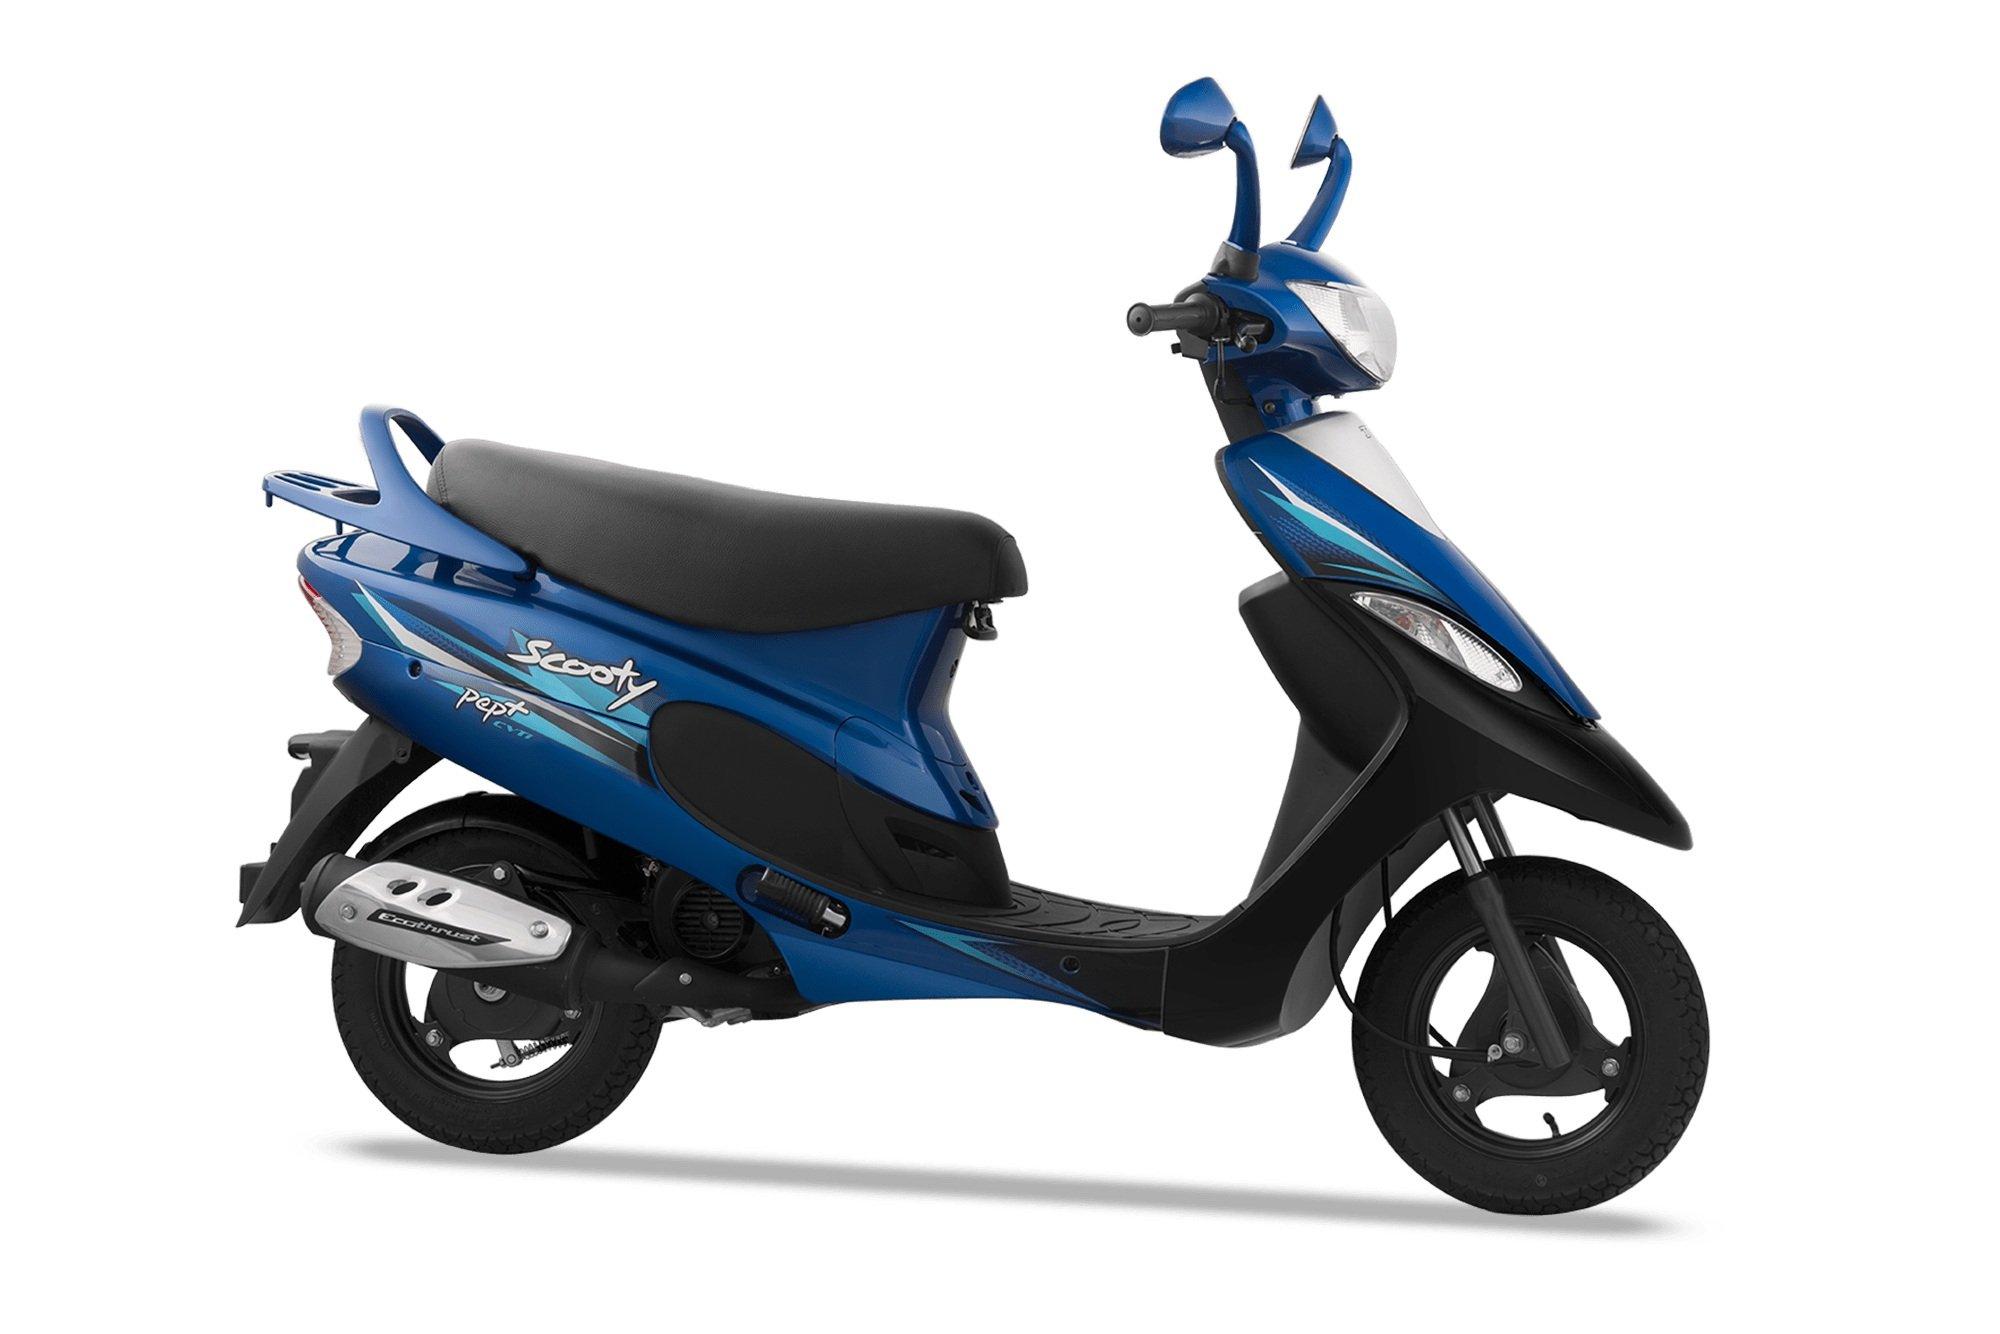 Nearest Honda Dealer >> TVS Scooty Pep Plus Price, Specifications India